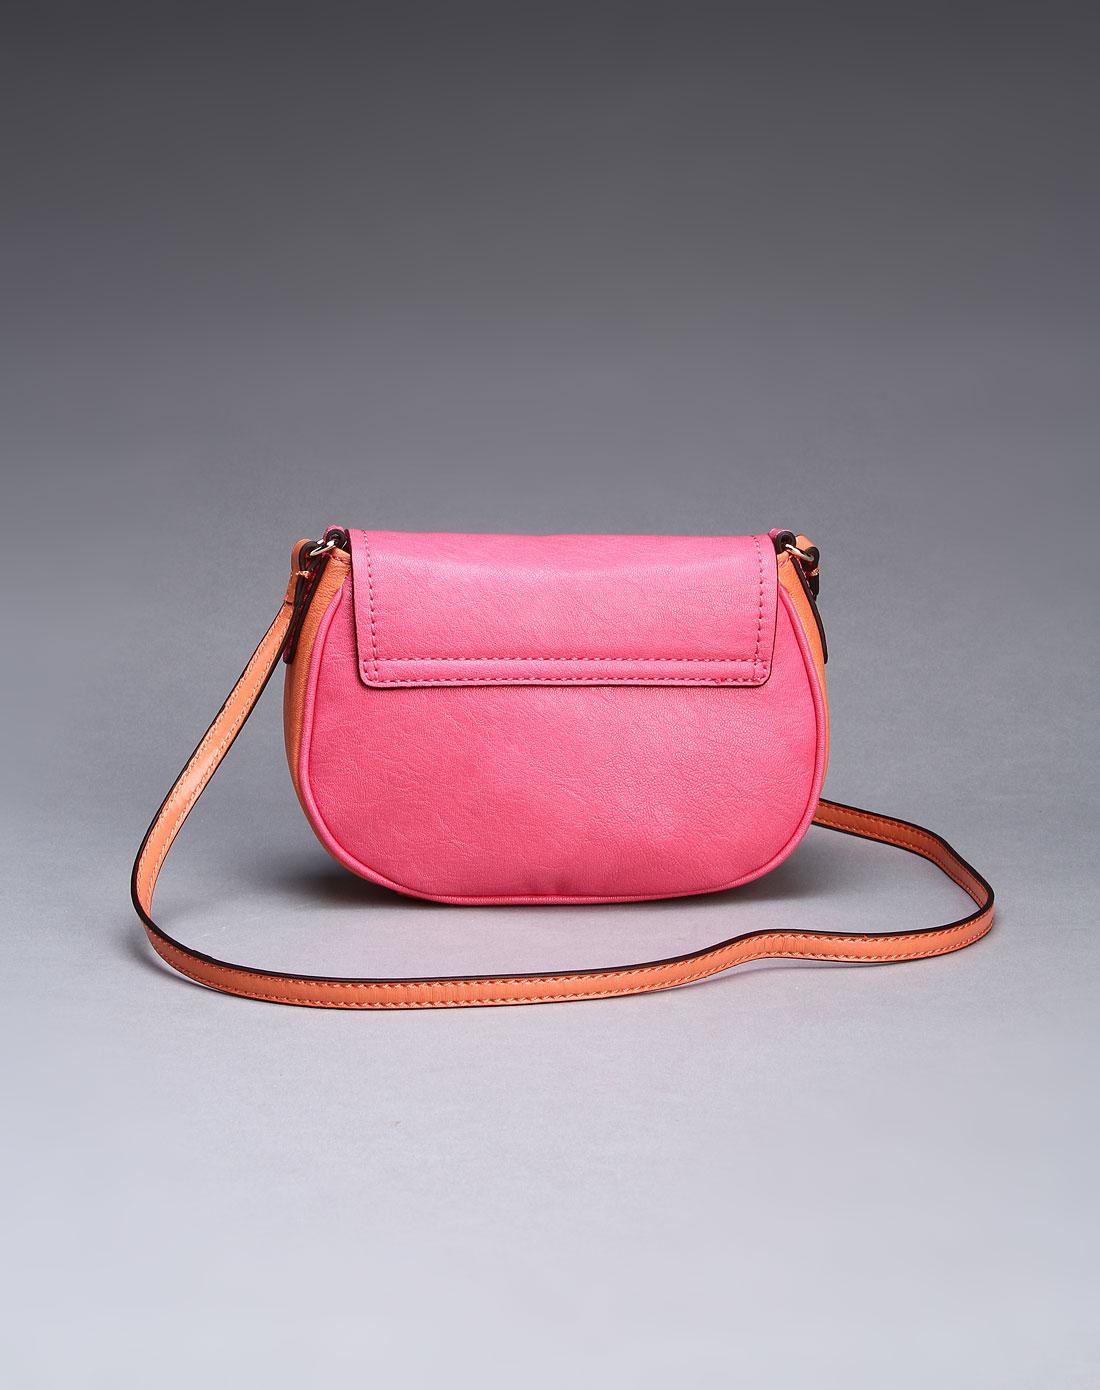 guess包包专场-女款热情可爱斜挎包粉红色